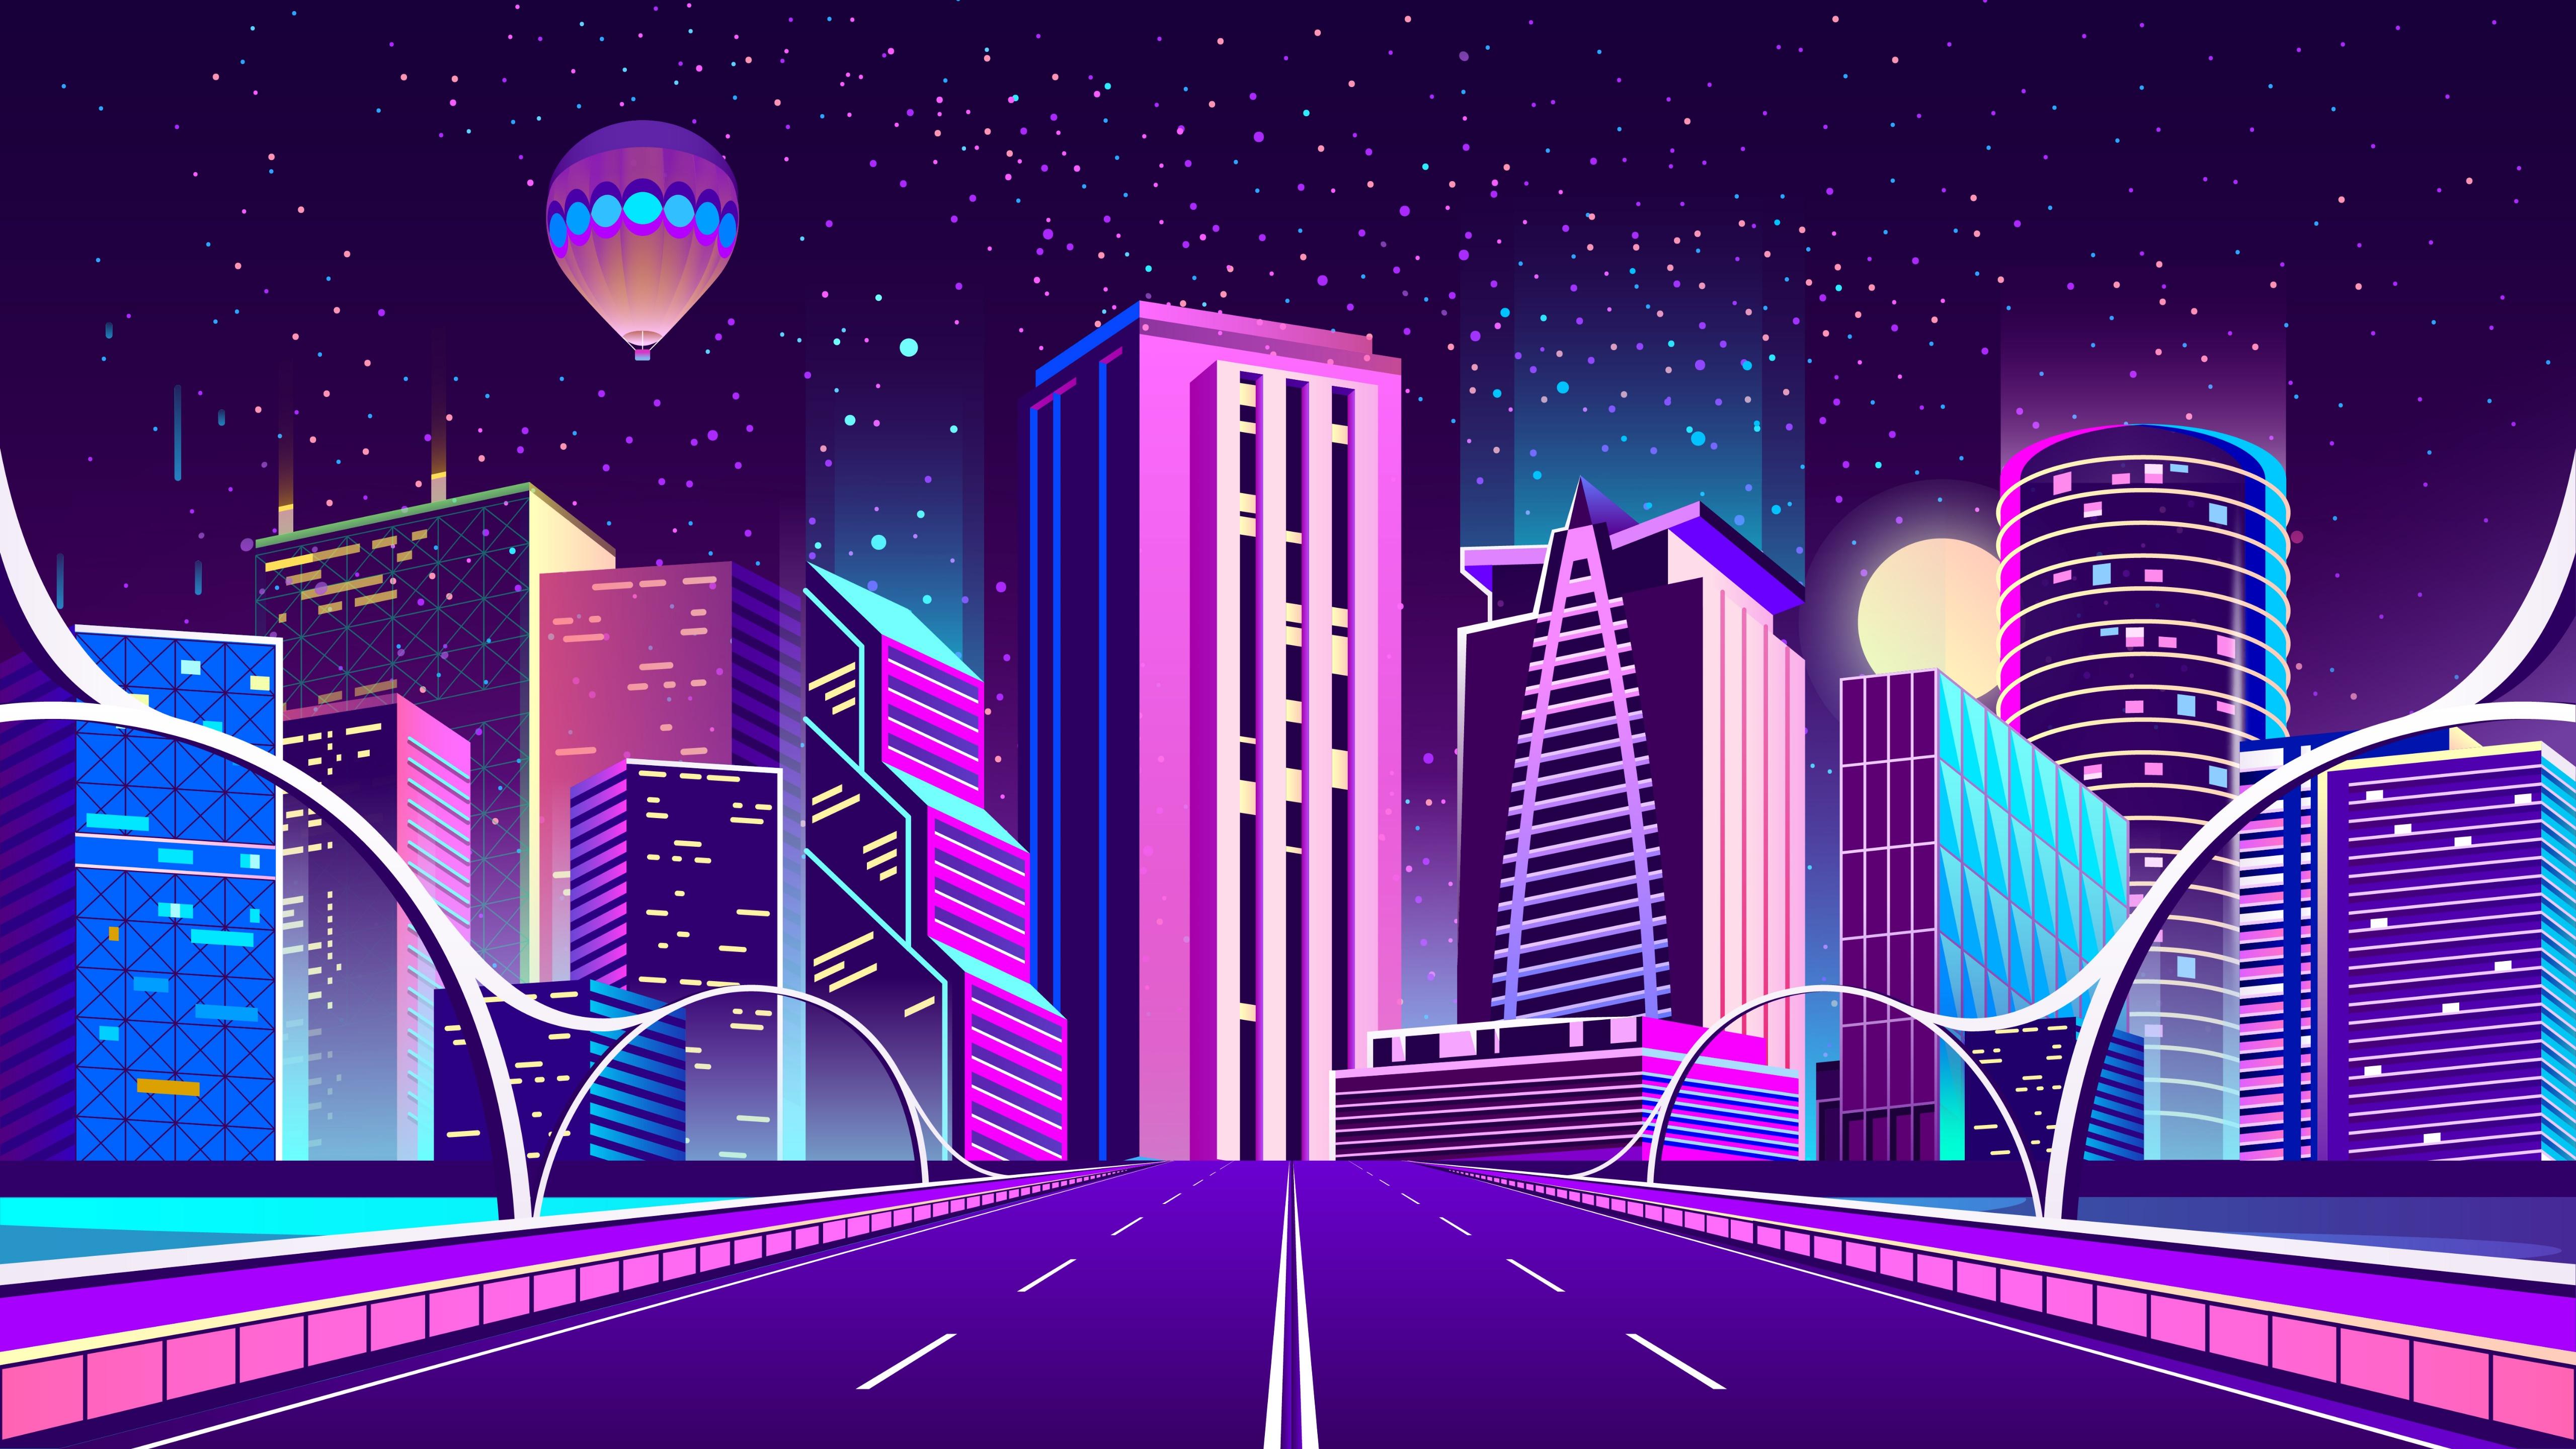 Purple metropolis digital art wallpaper